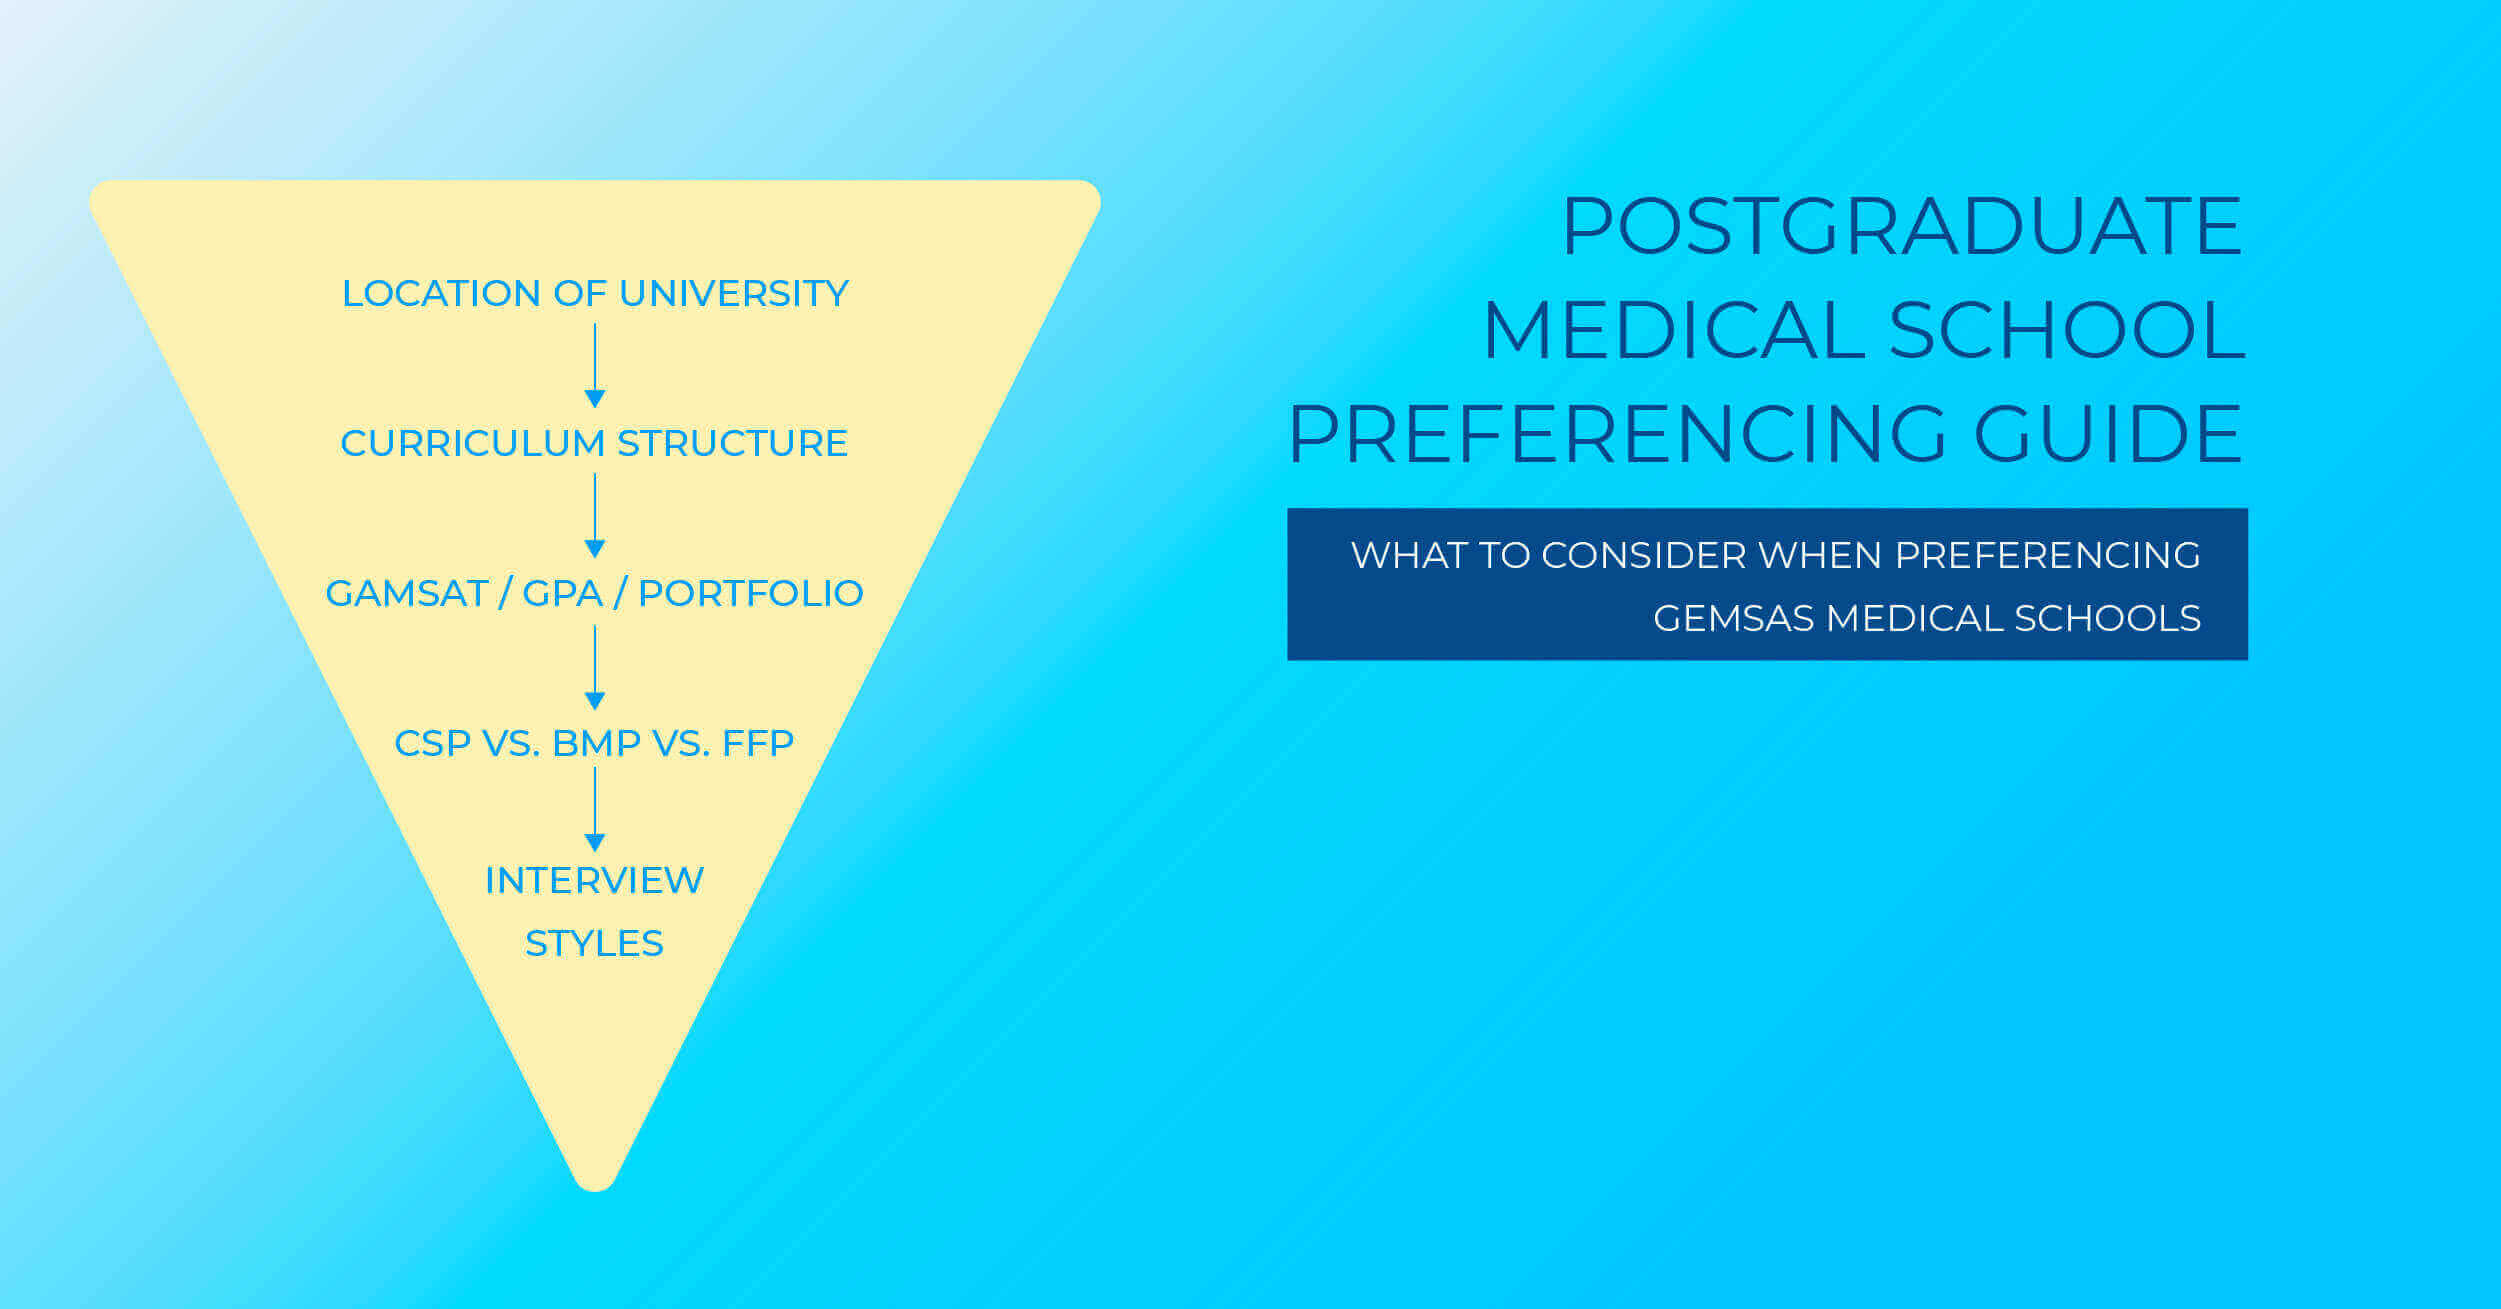 medical school preferencing guide